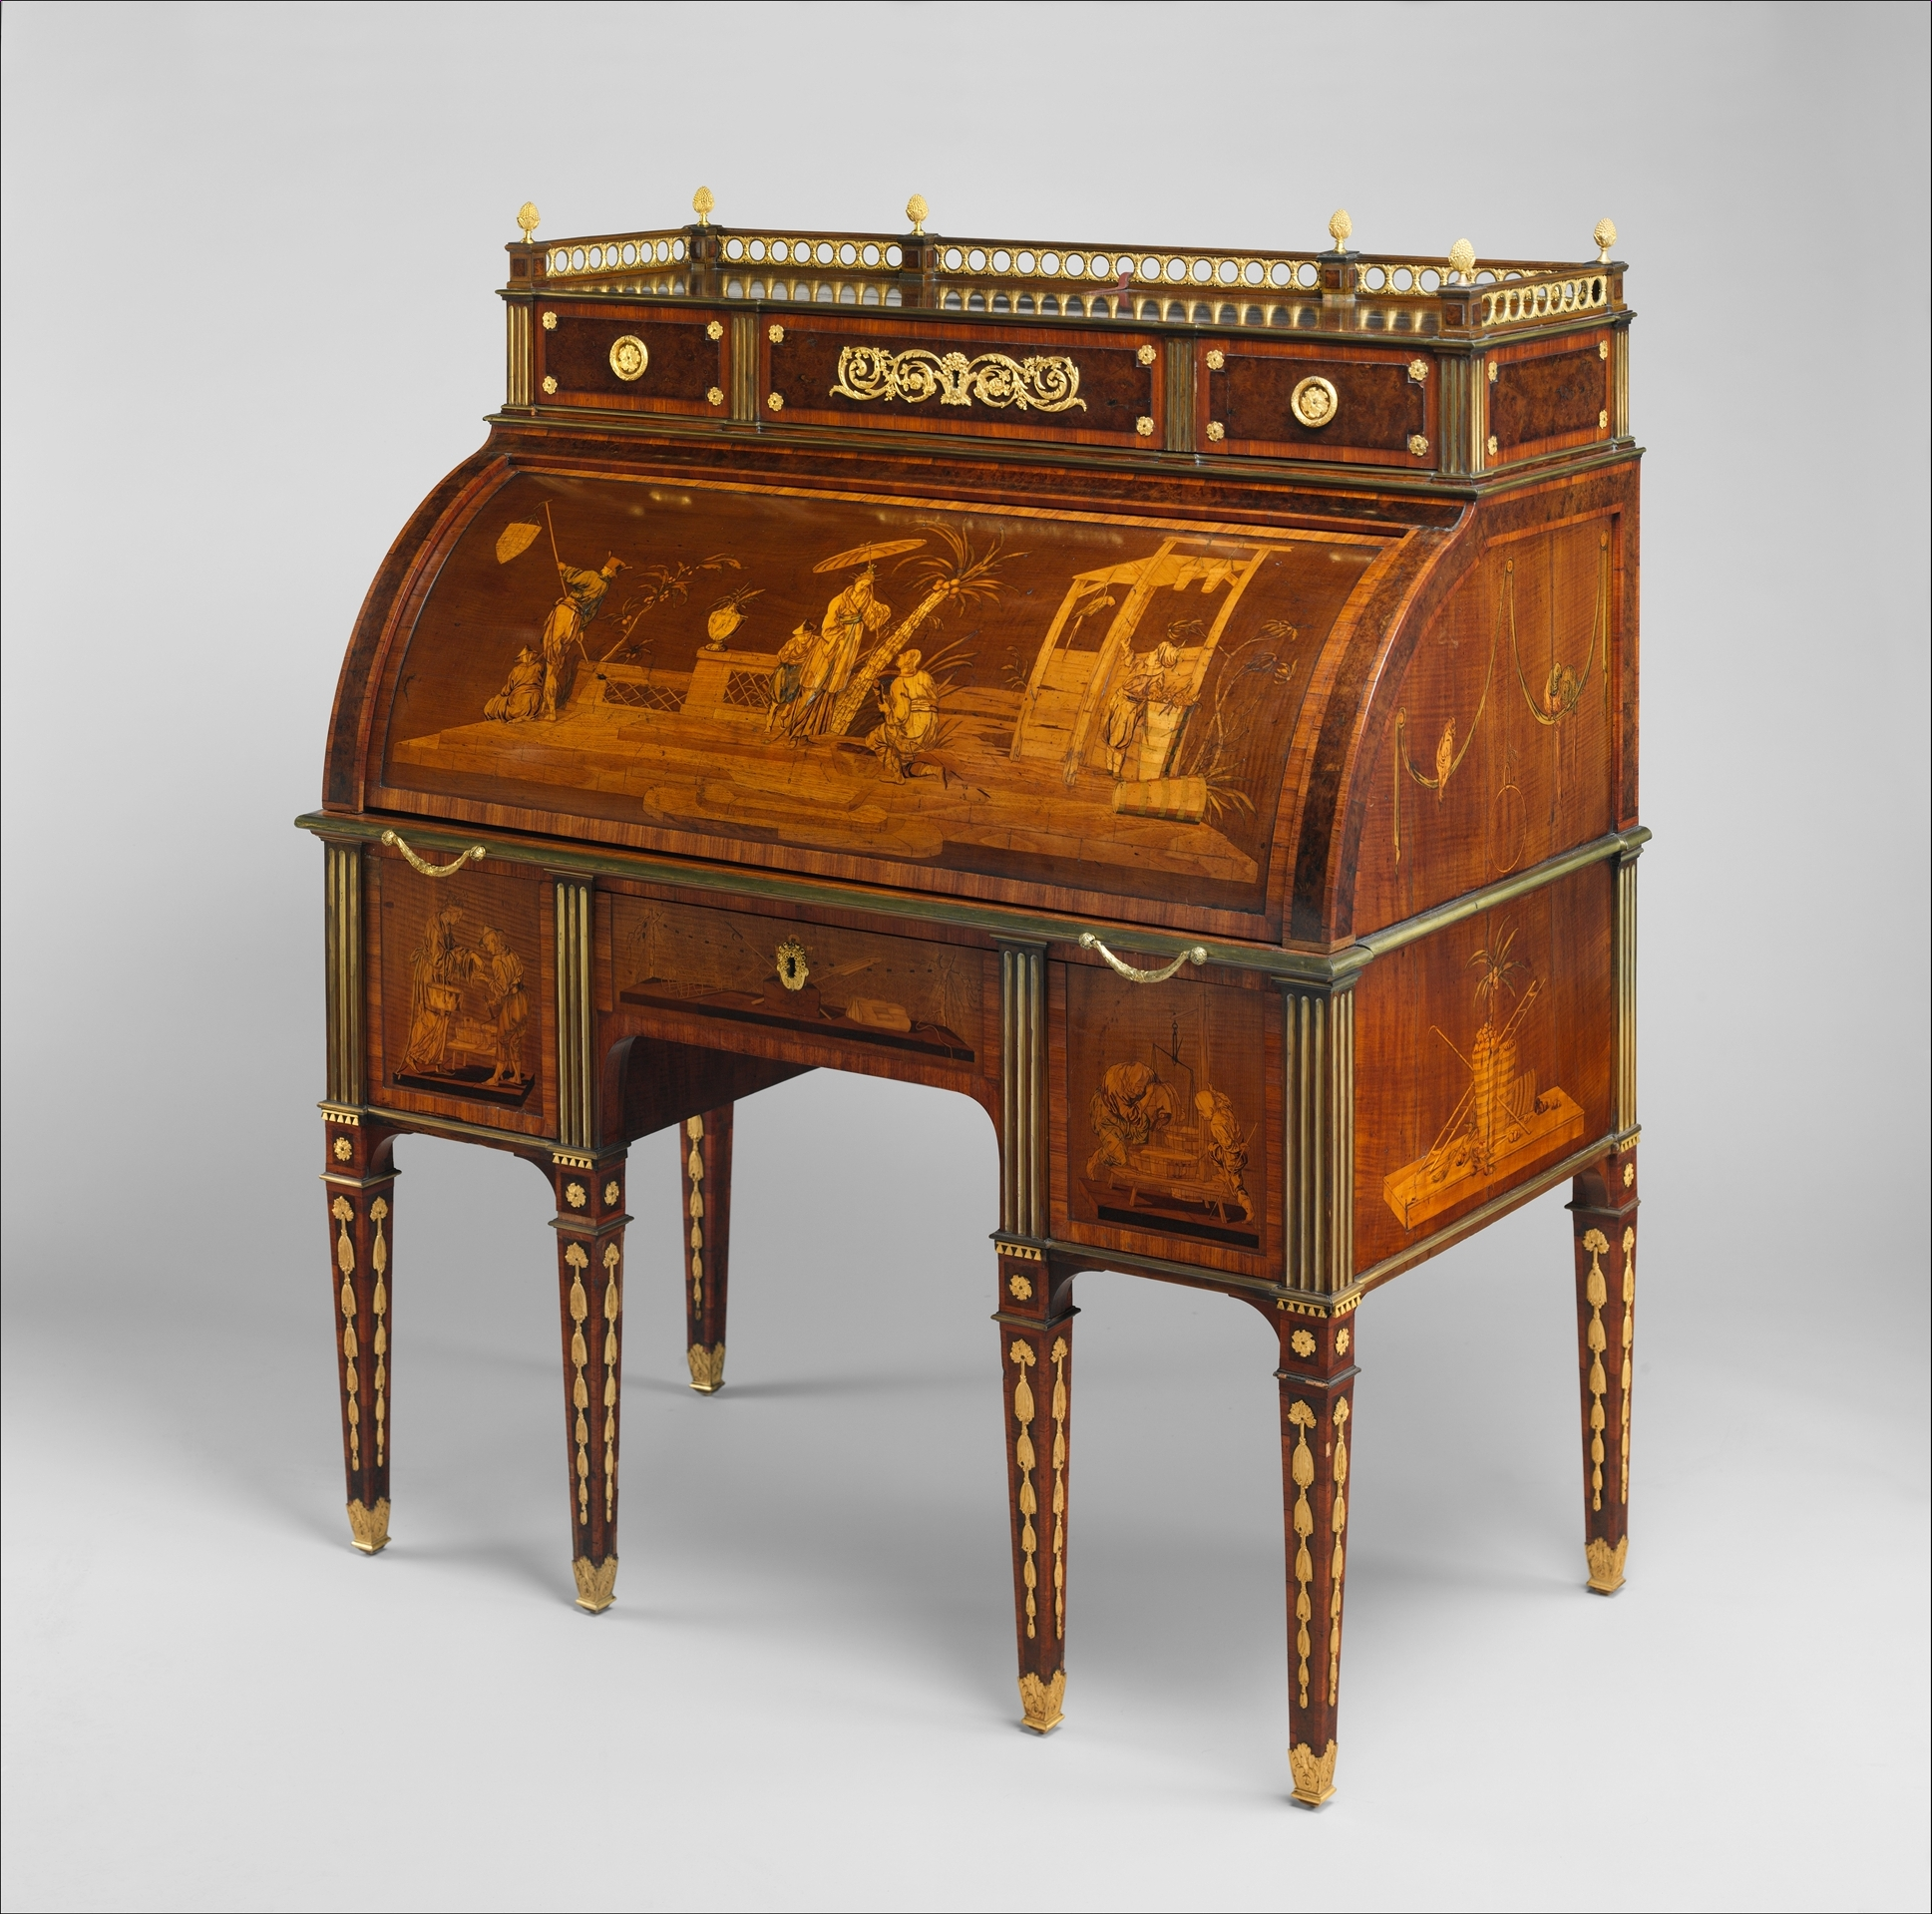 Antique Style Solid Brass Rolltop Desk Keyhole Escutcheon